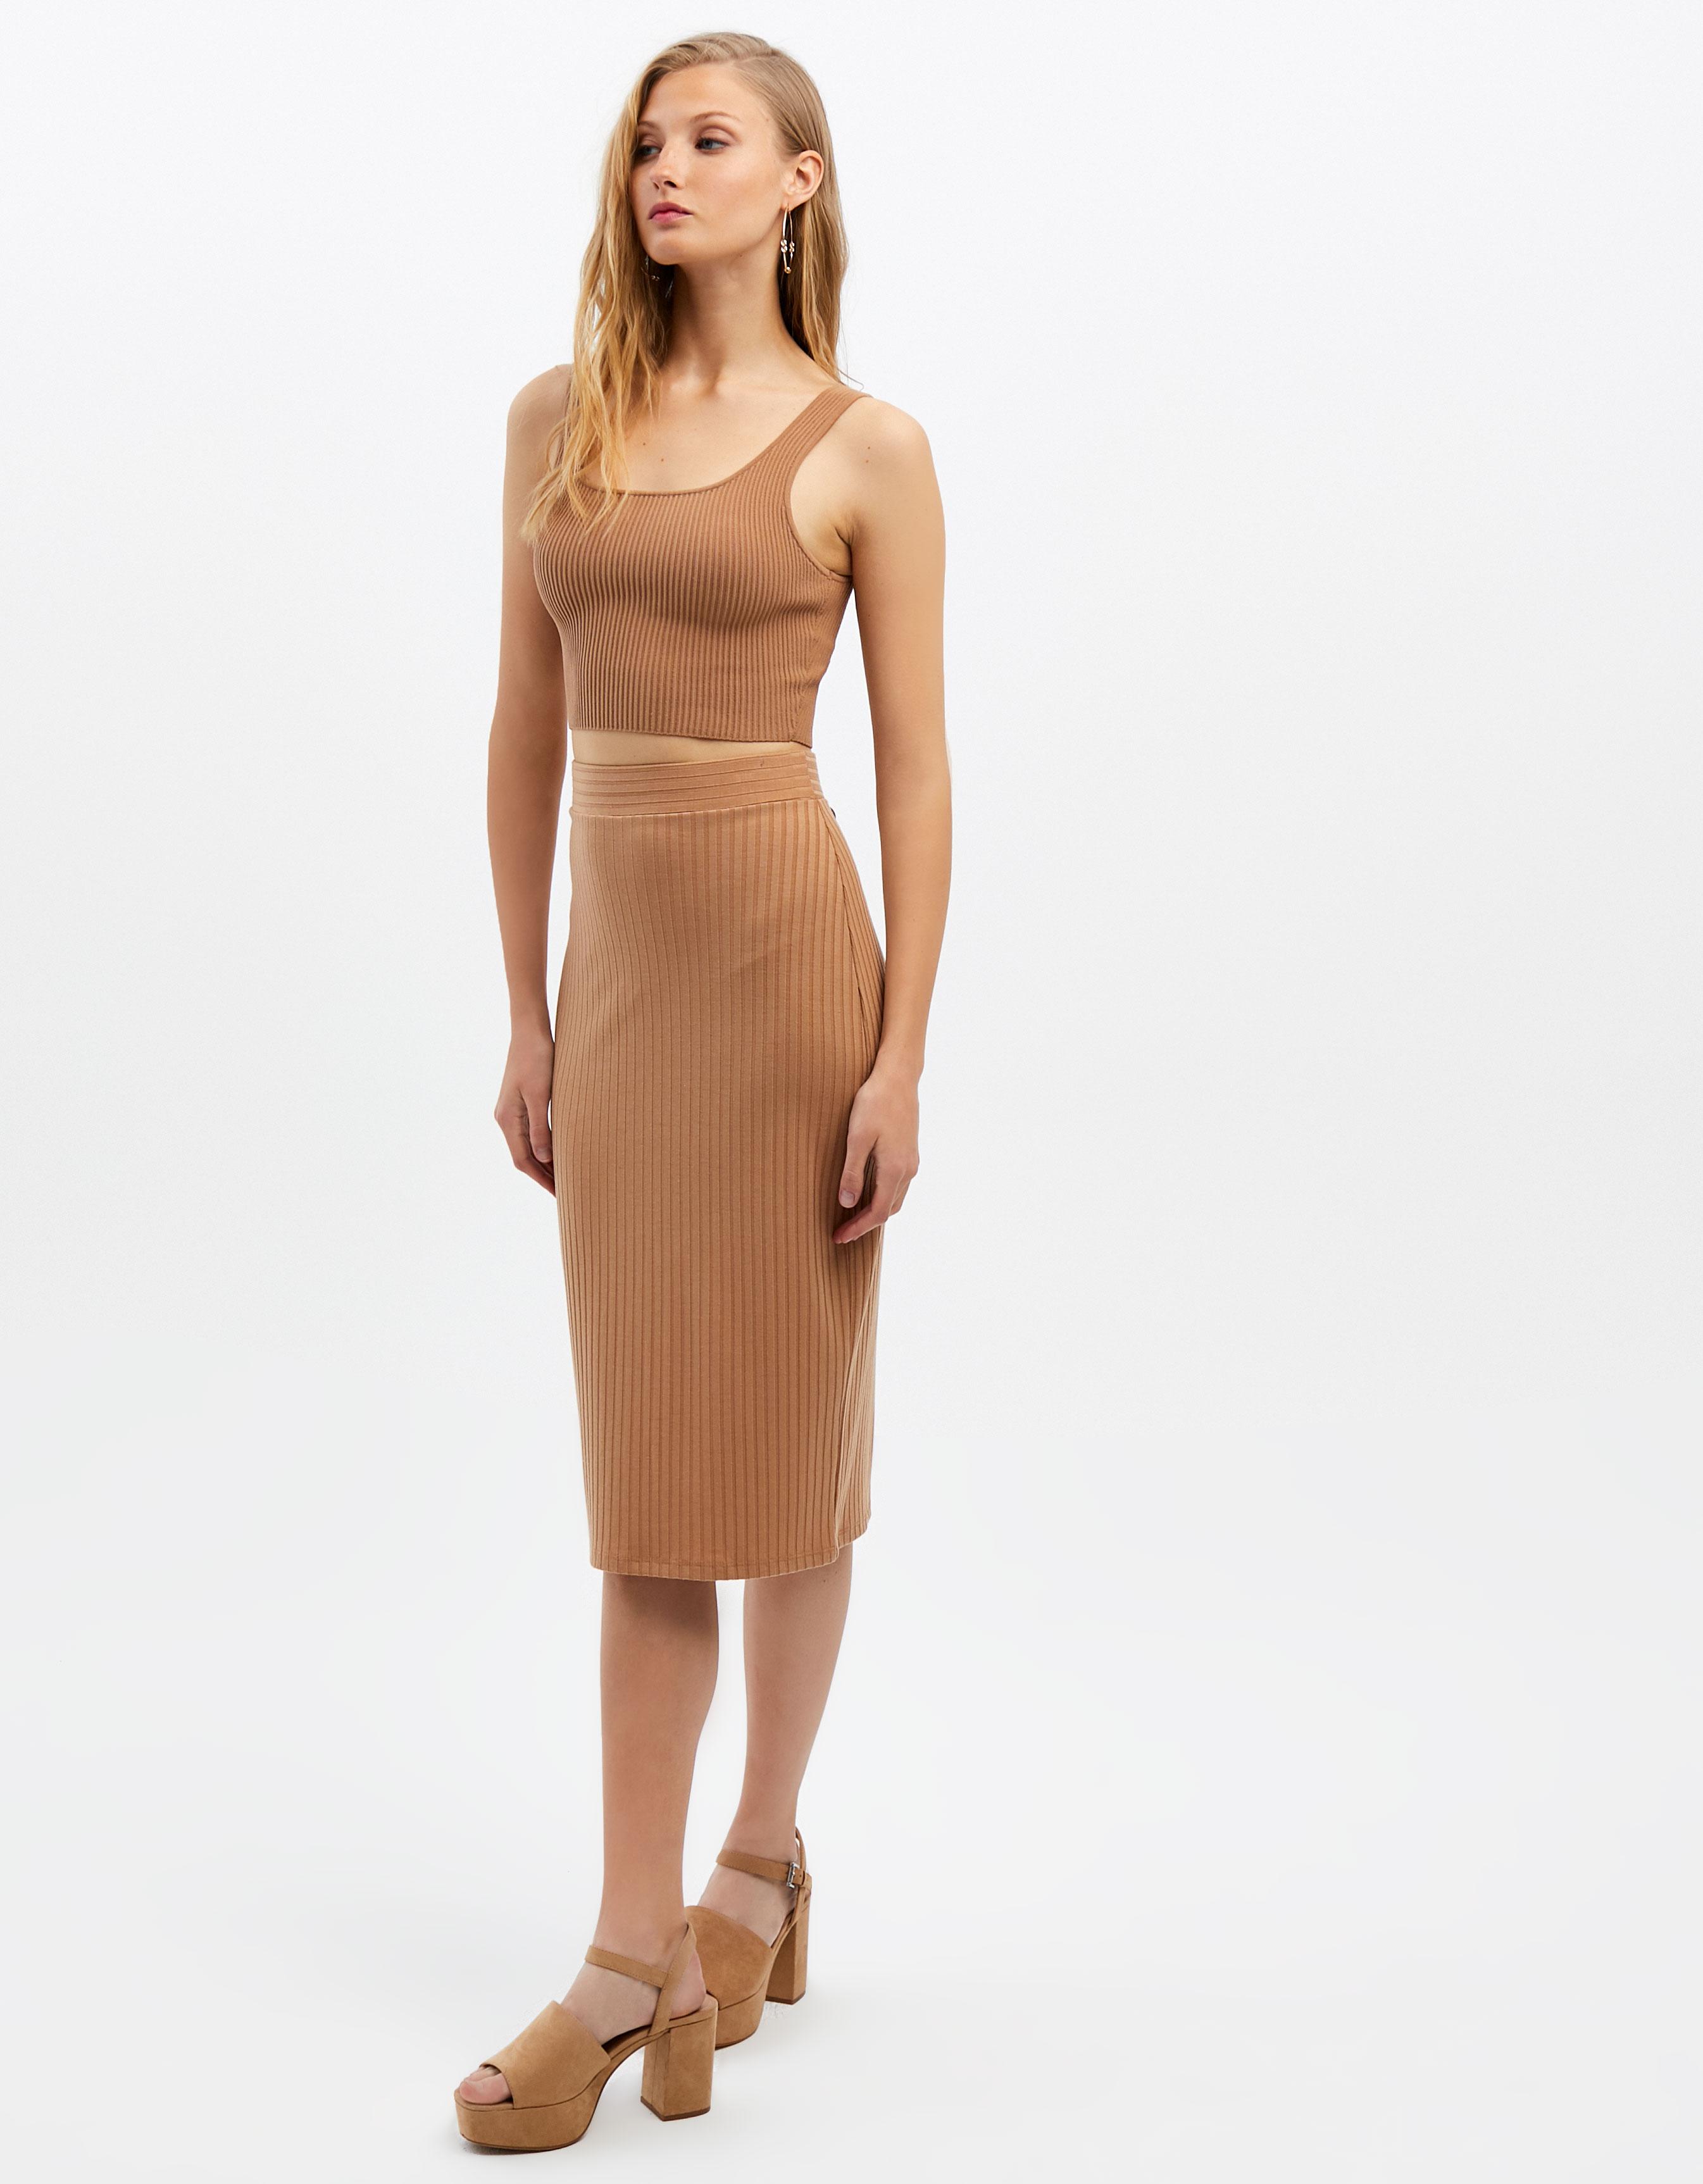 6053ae2290c3ea Beige Pencil Skirt | TALLY WEiJL Online Shop